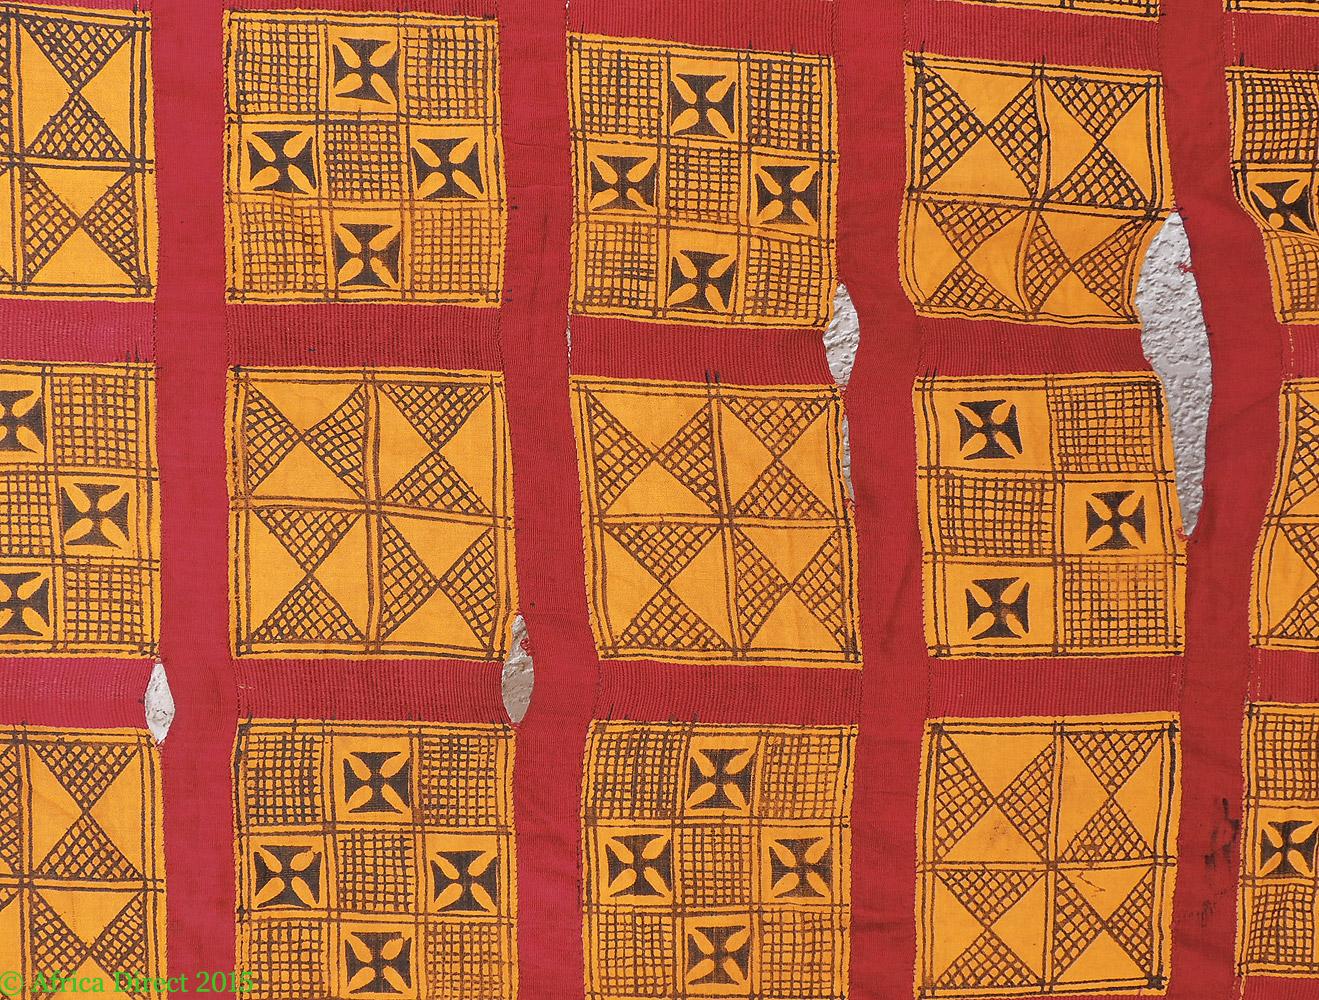 adinkra stamped cloth asante ghana large africa 10 x 6 feet